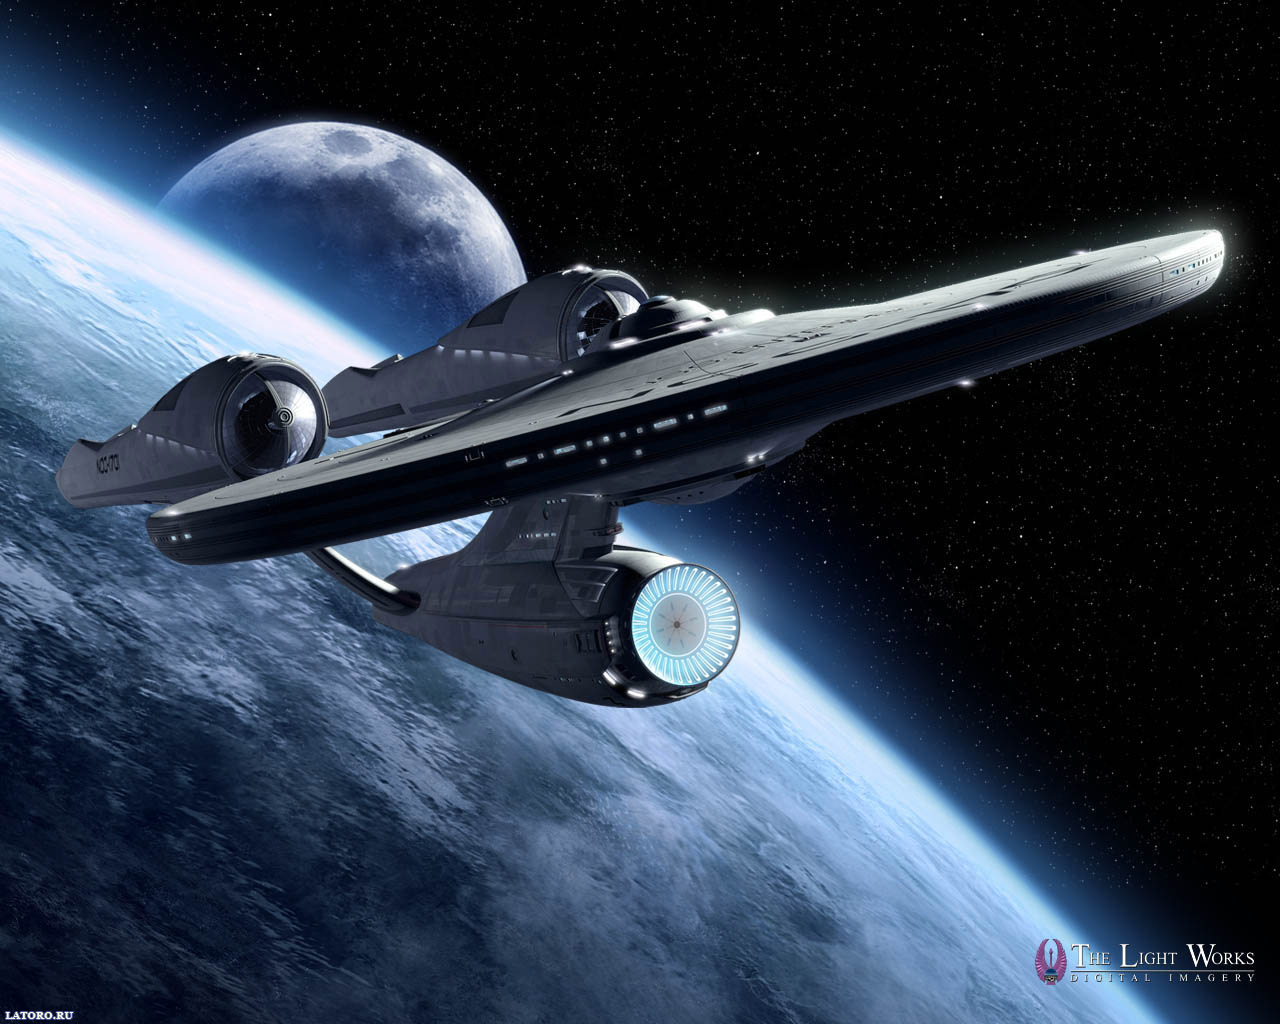 Star Trek Desktop Wallpapers FREE on Latorocom 1280x1024